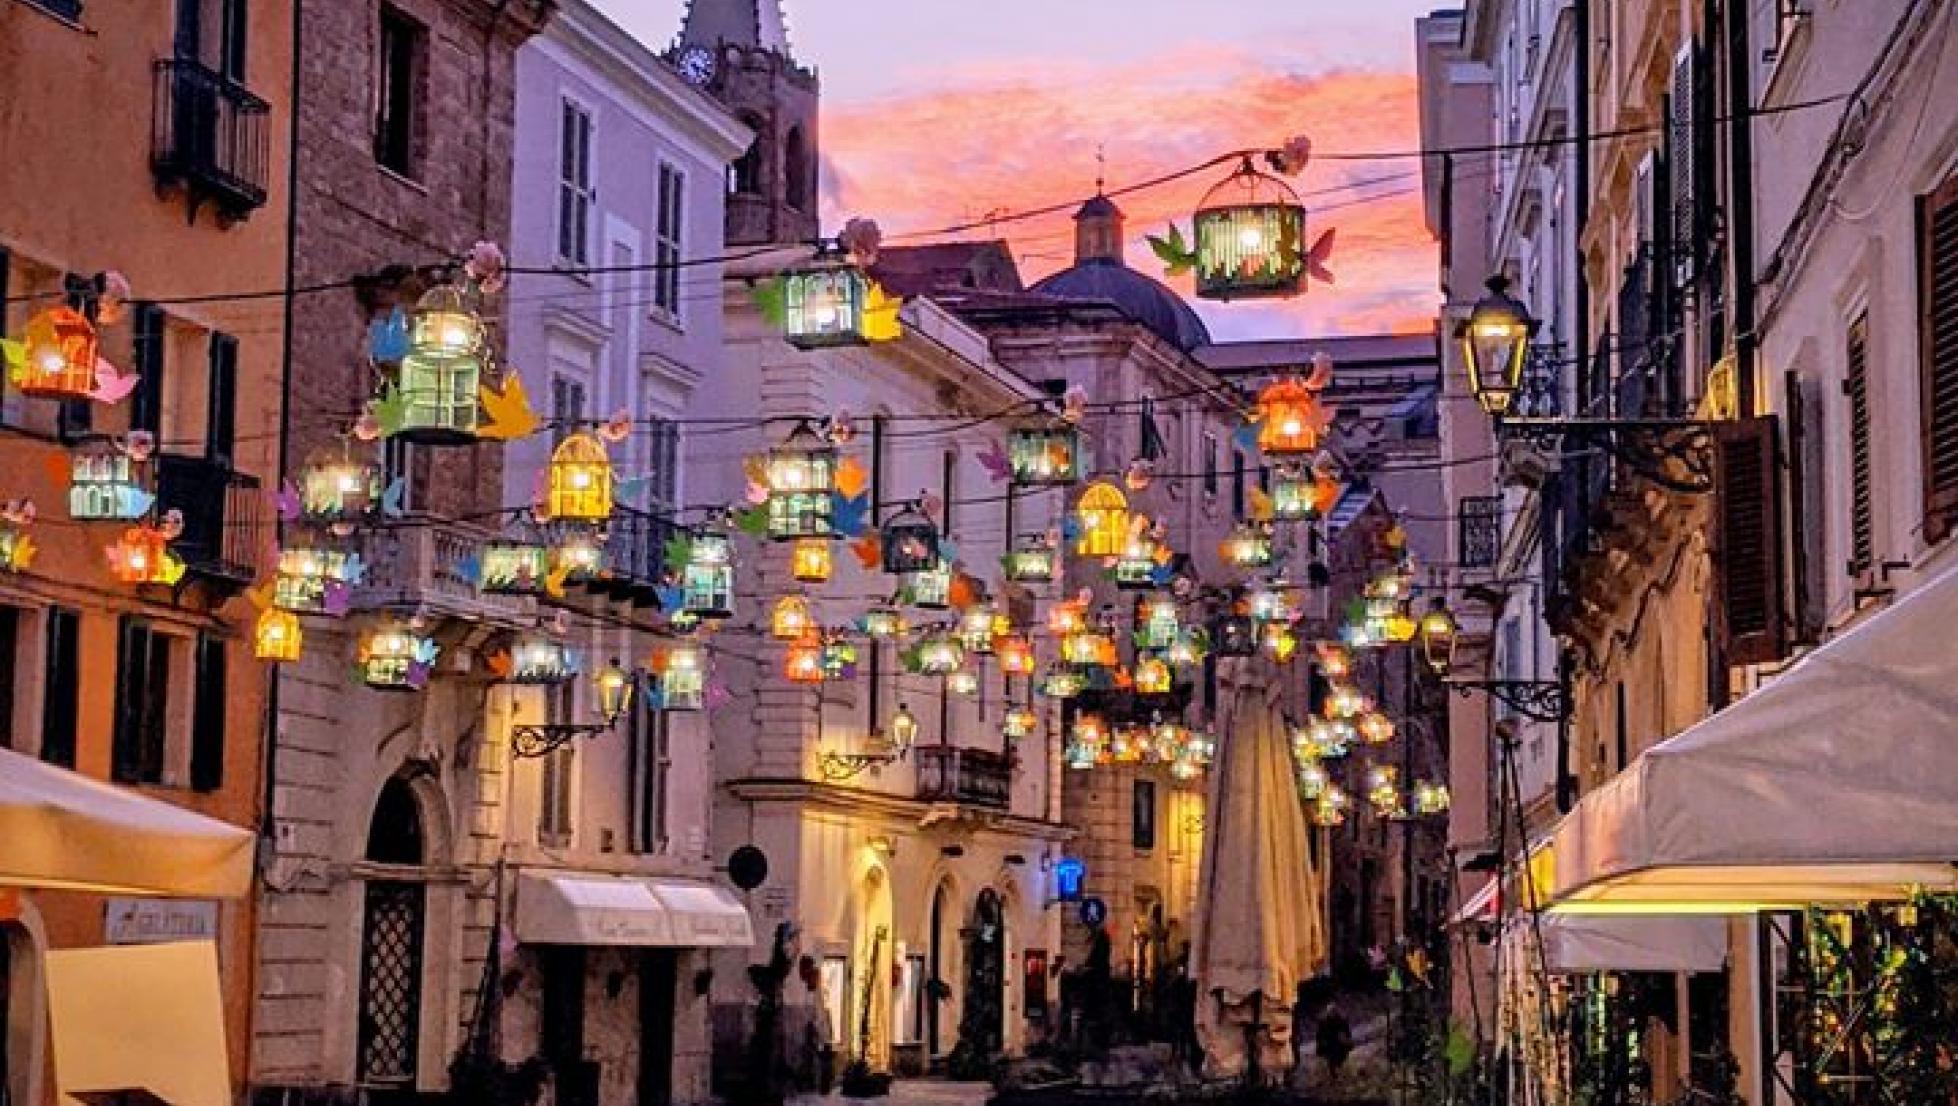 Natale 2019 ad Alghero